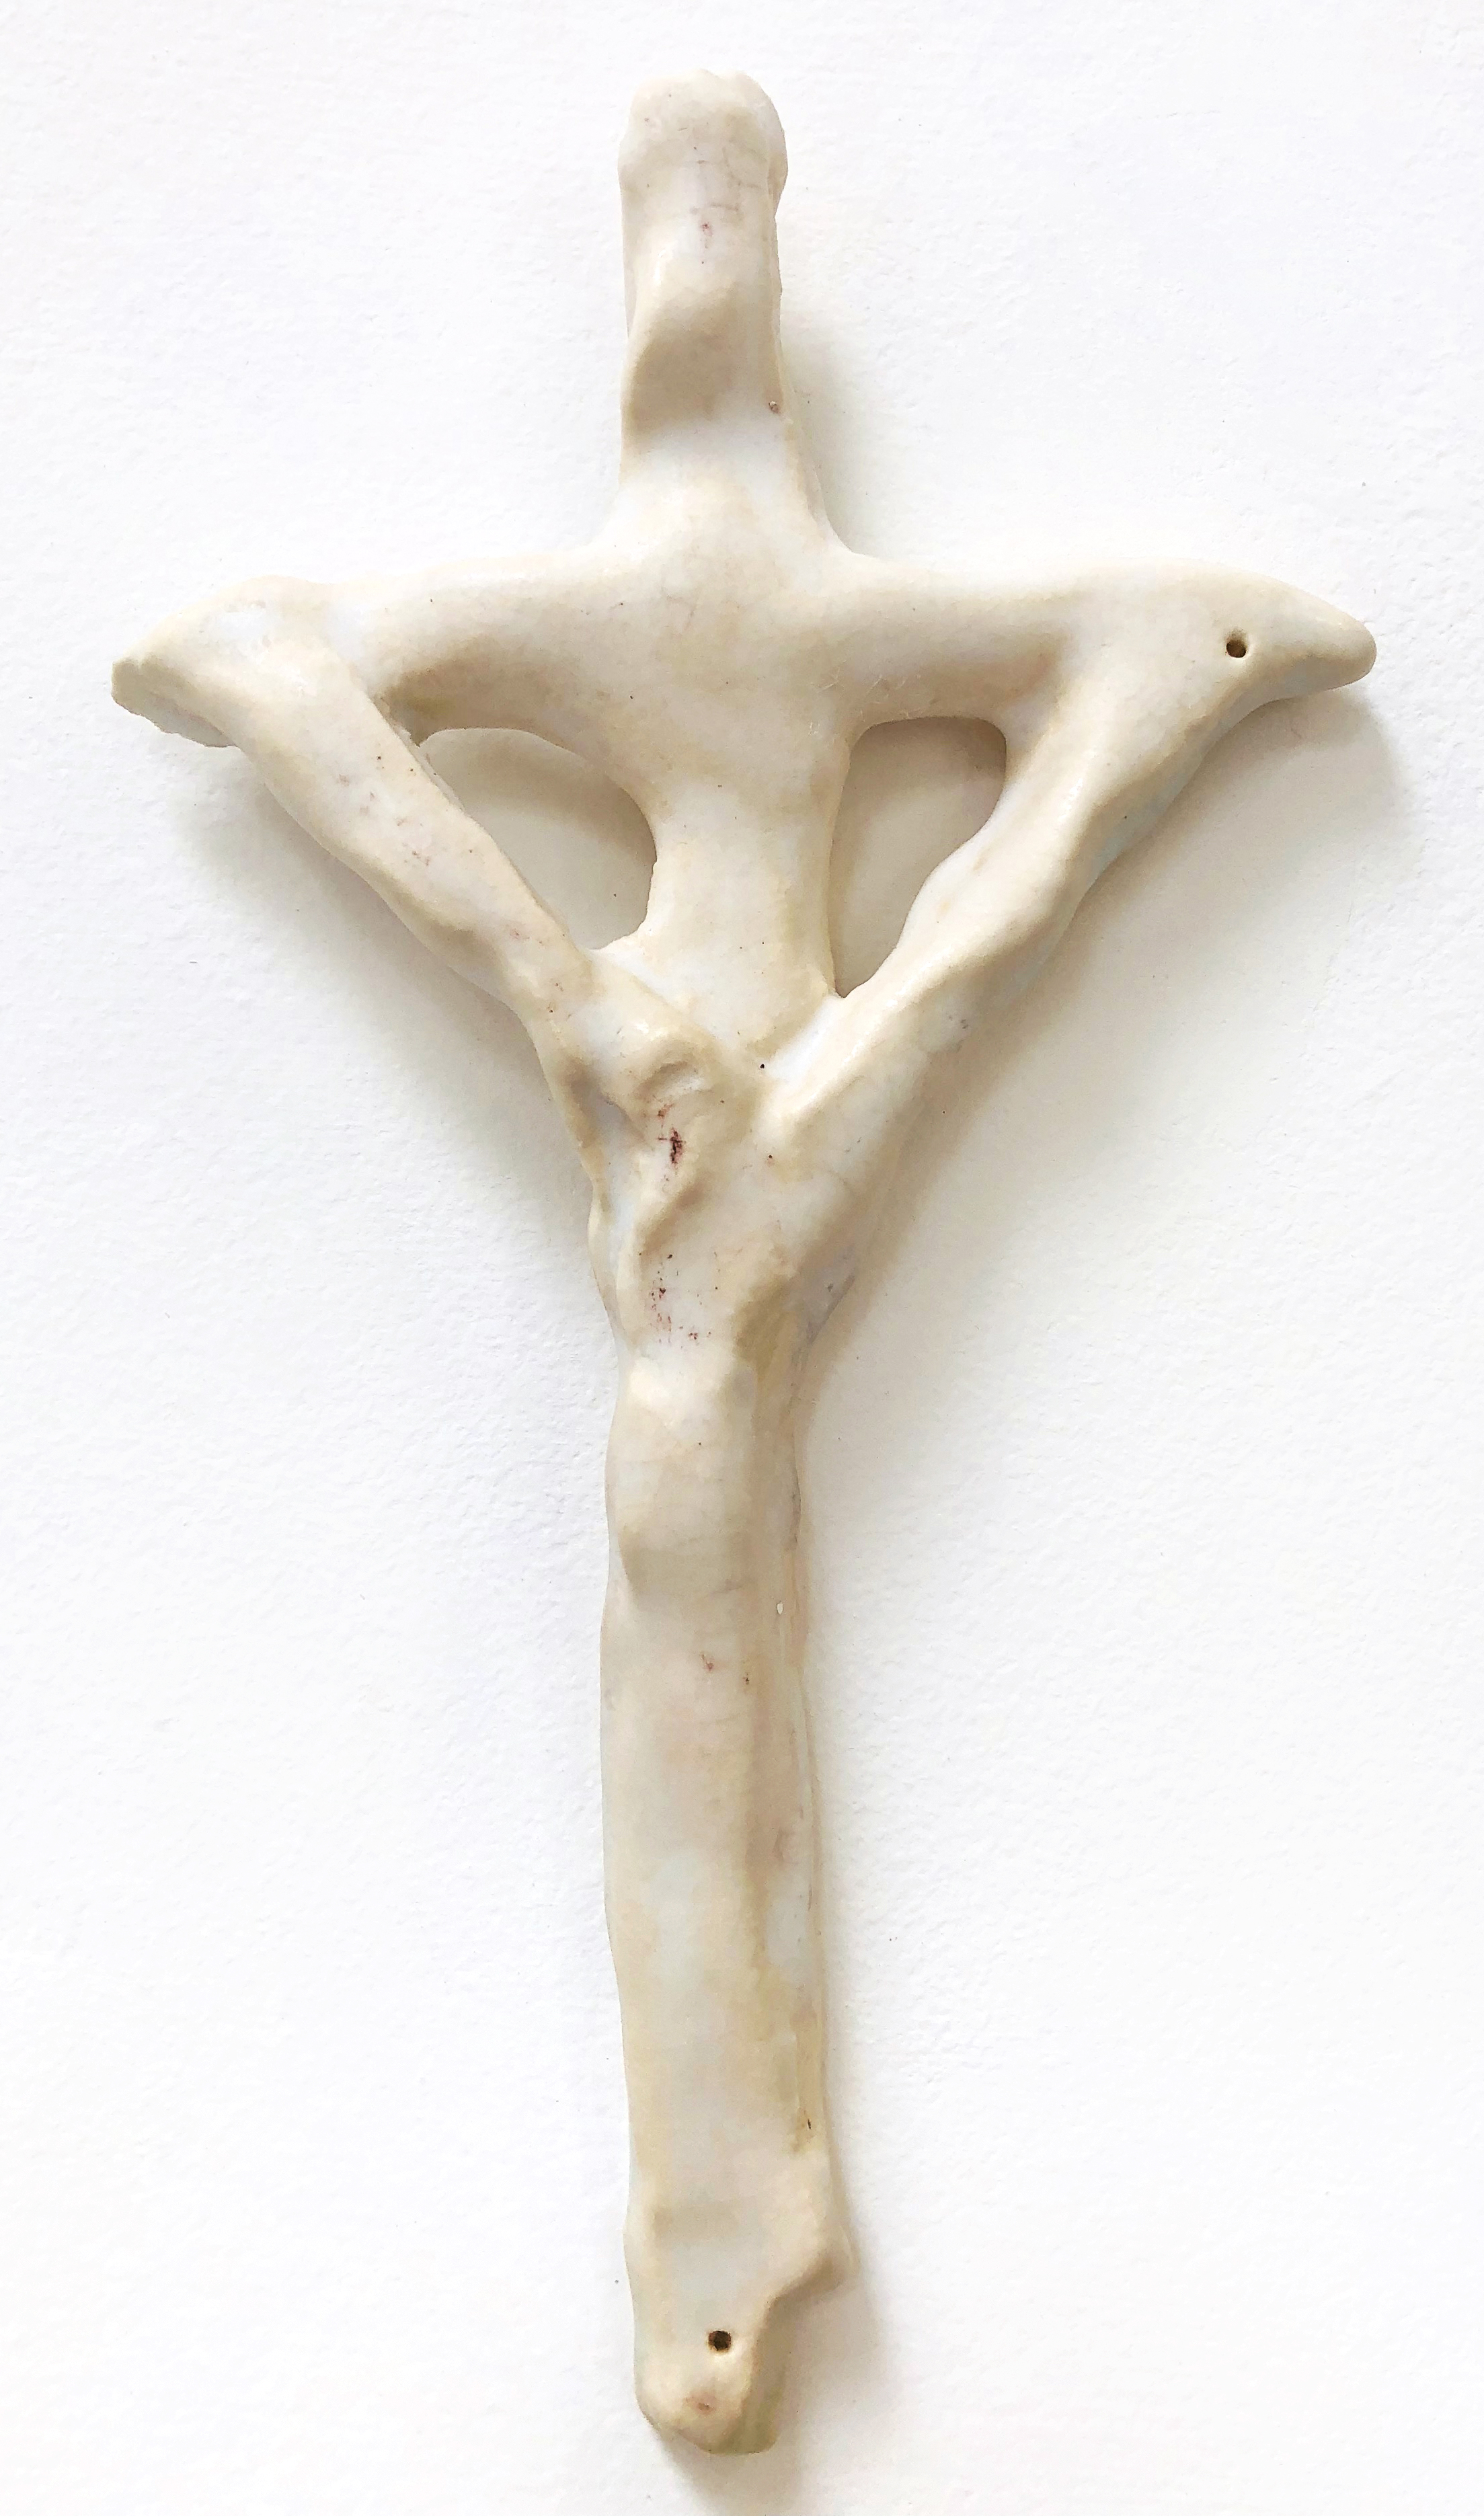 20-220x130-$1150-RichardLewer-Crucifix.jpg